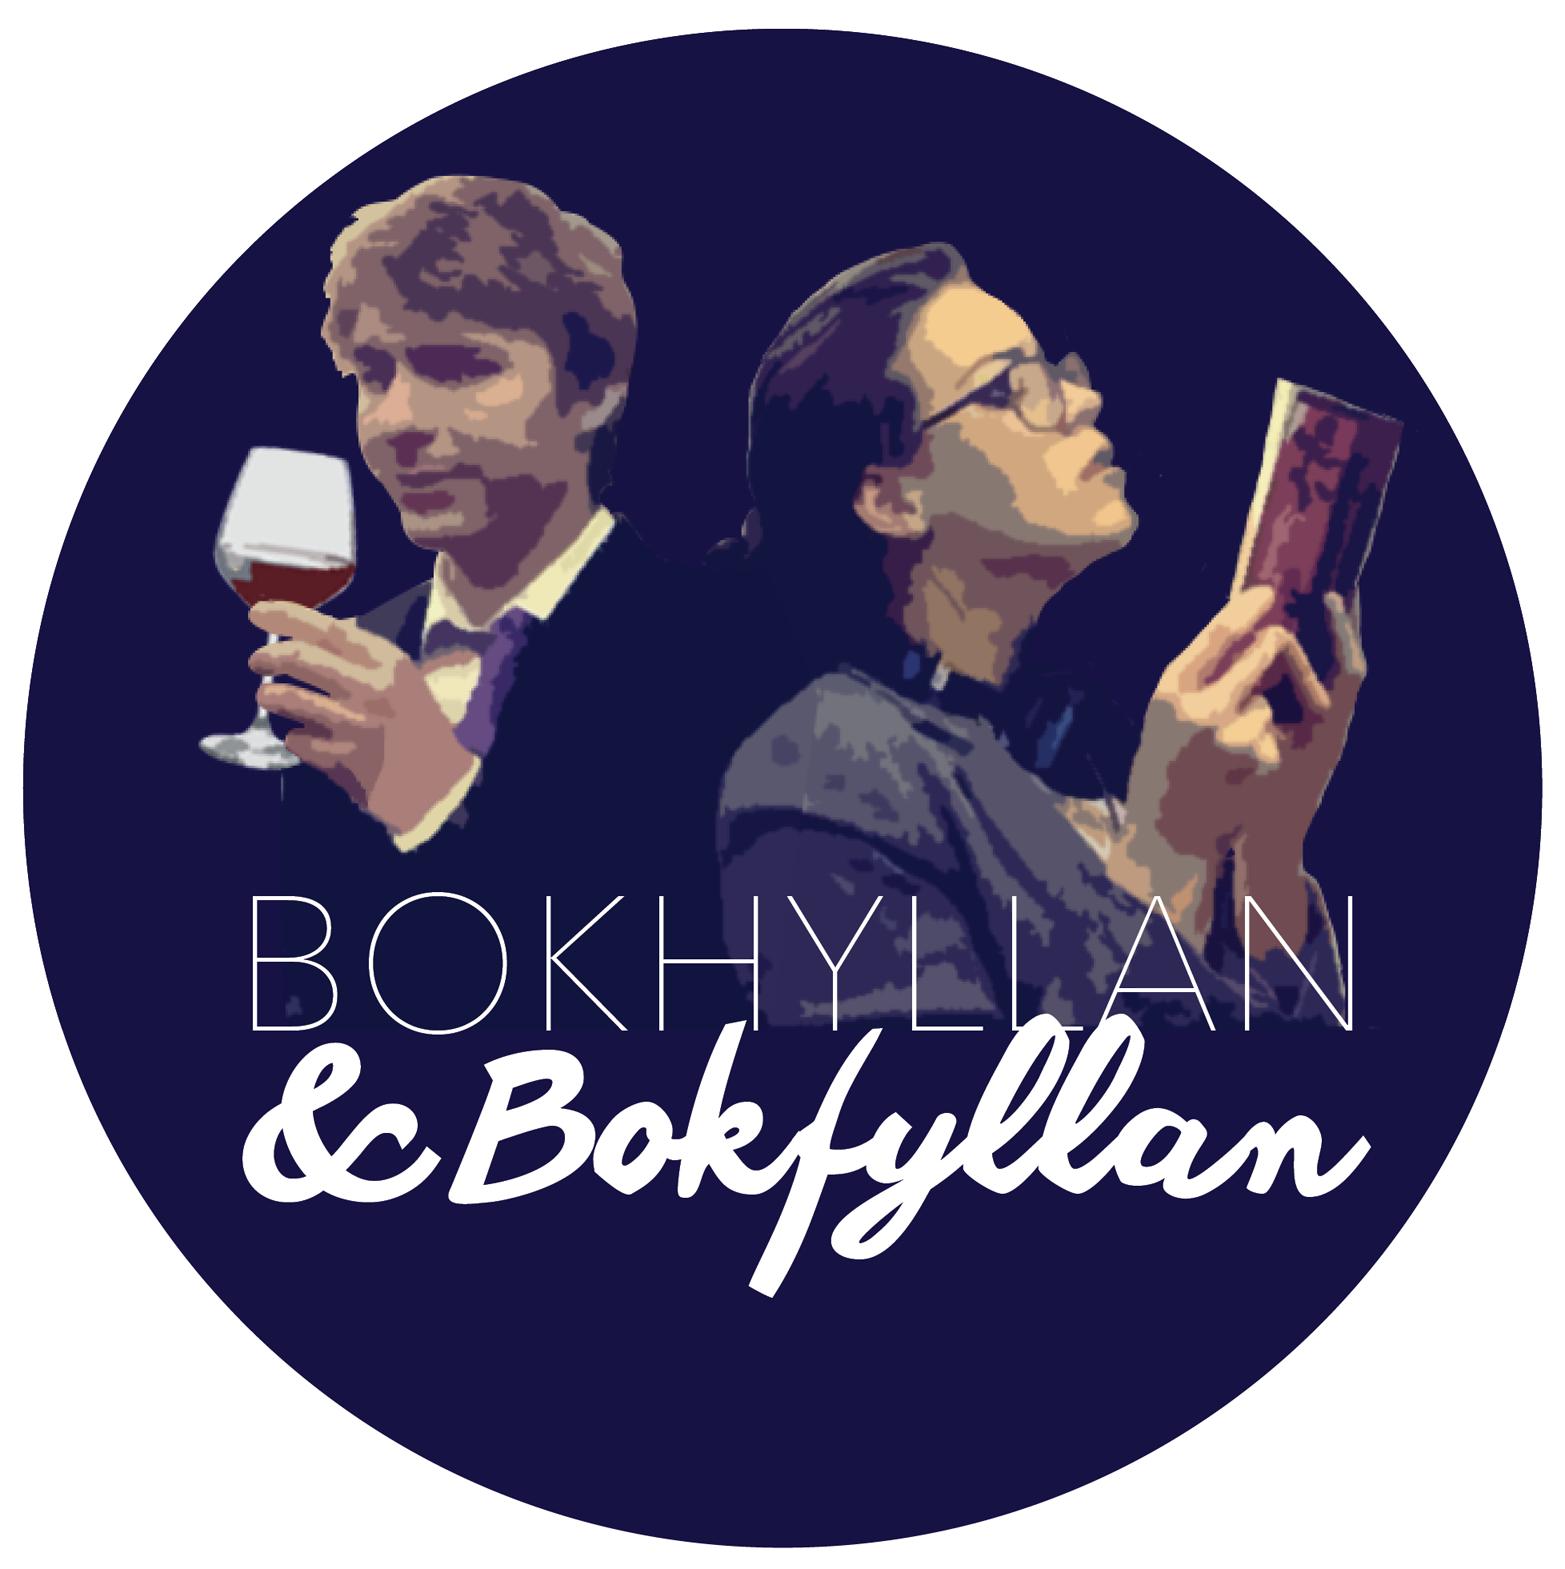 Podcast – Bokhyllan & Bokfyllan